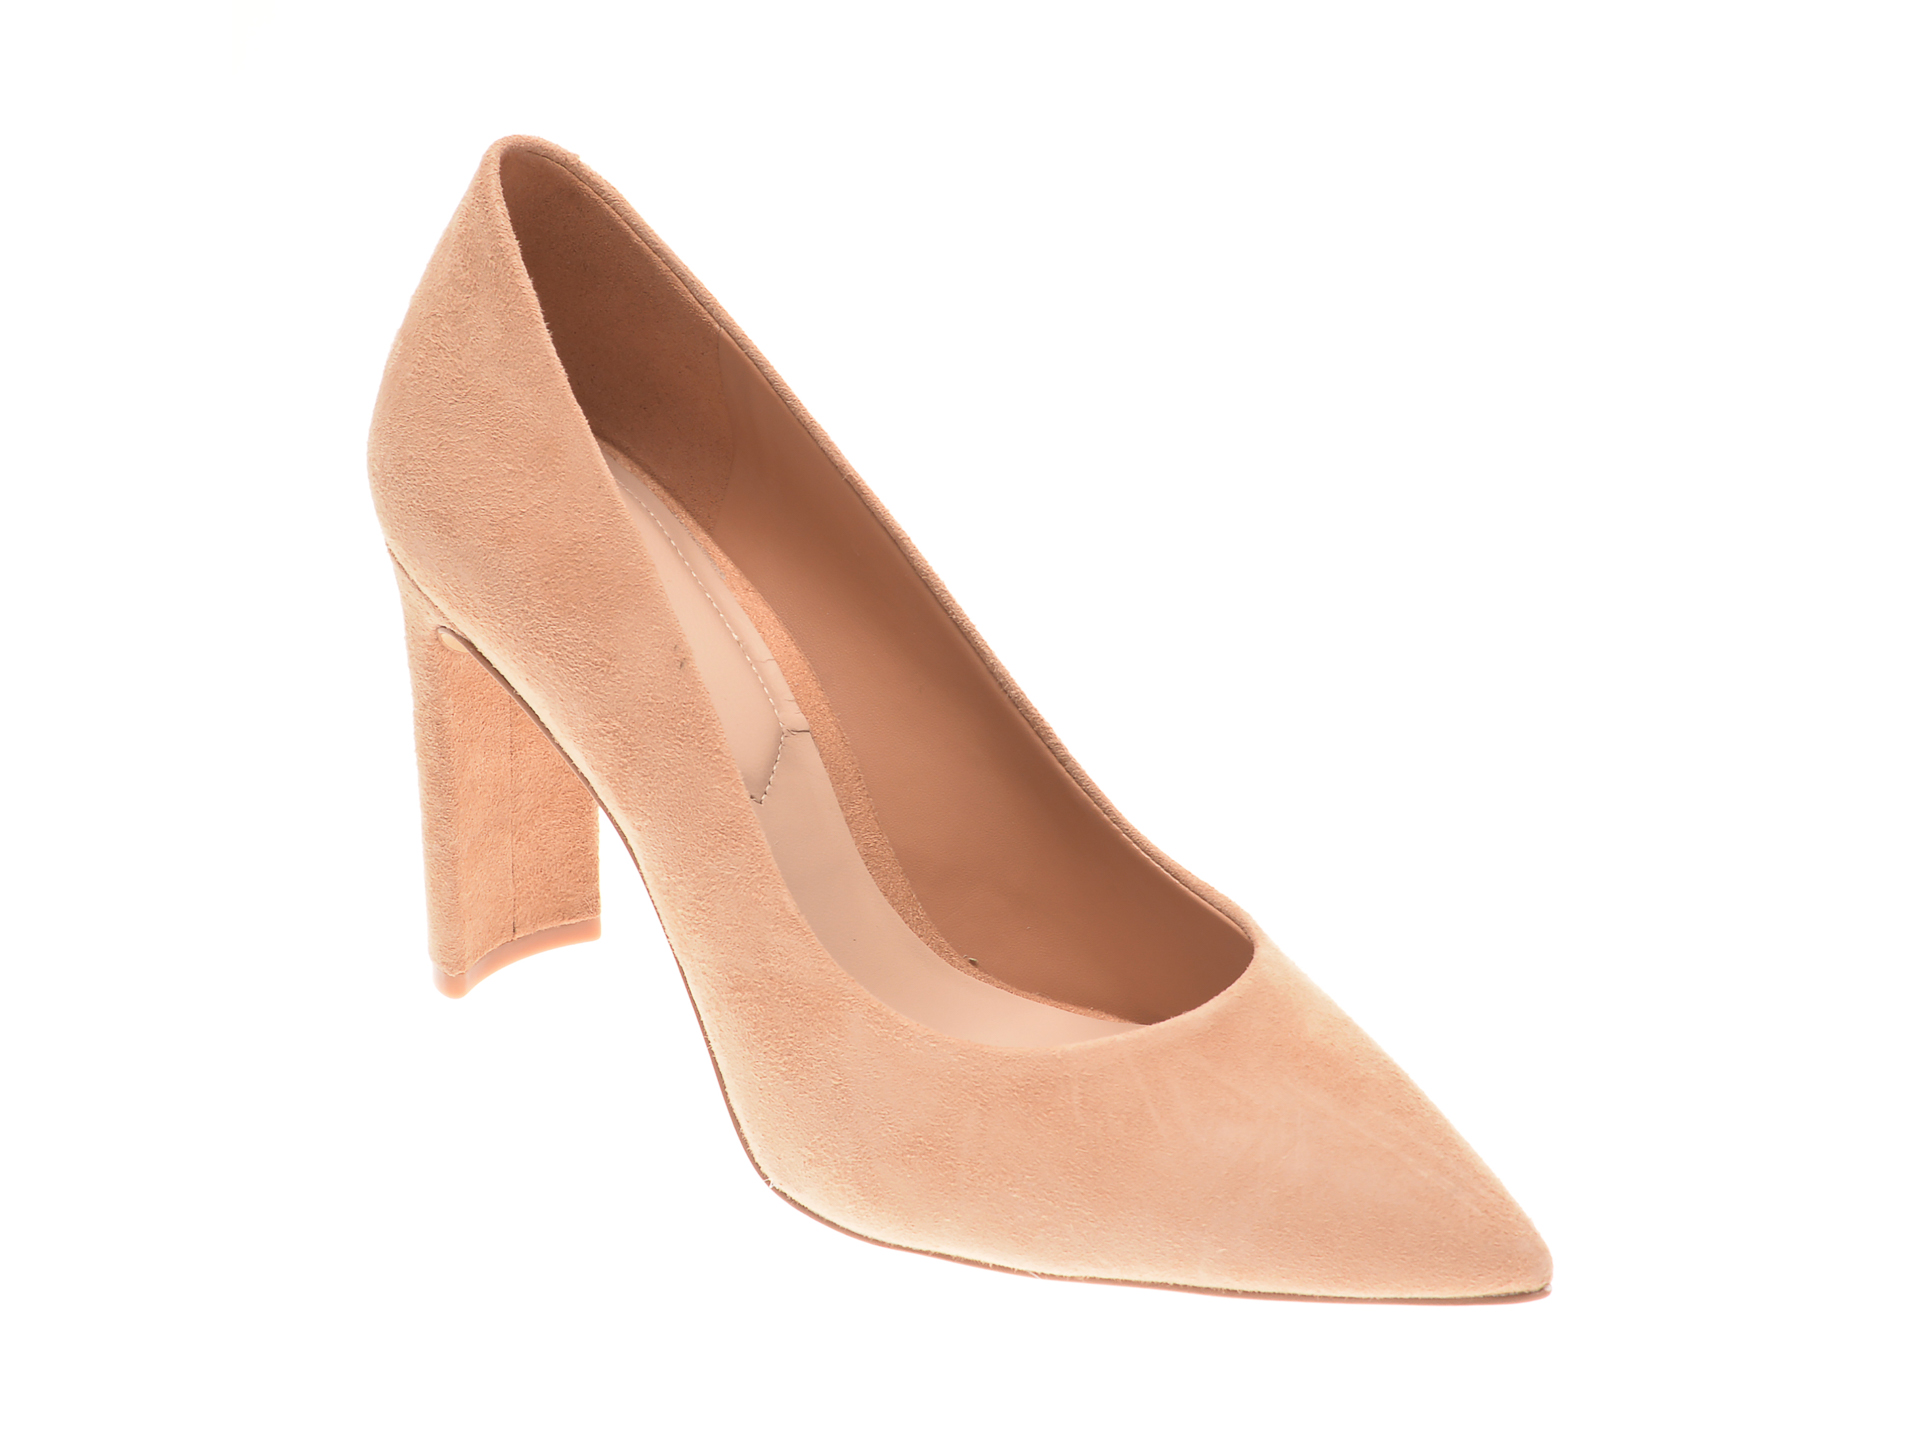 Pantofi ALDO nude, Febriclya260, din piele intoarsa imagine otter.ro